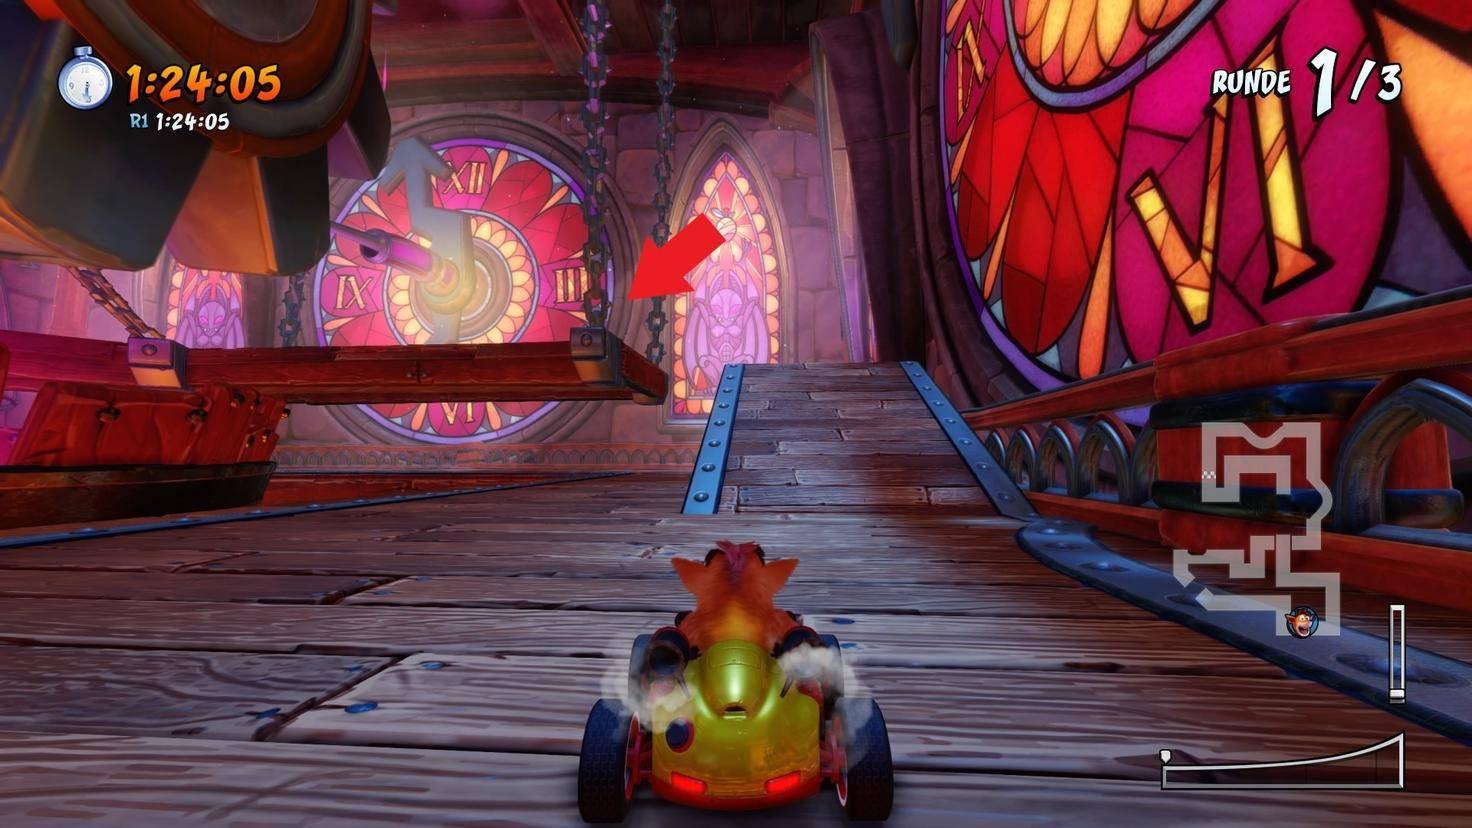 Crash-Team-Racing-Nitro-Fueled-Abkürzung-Uhr-Wumpa-2